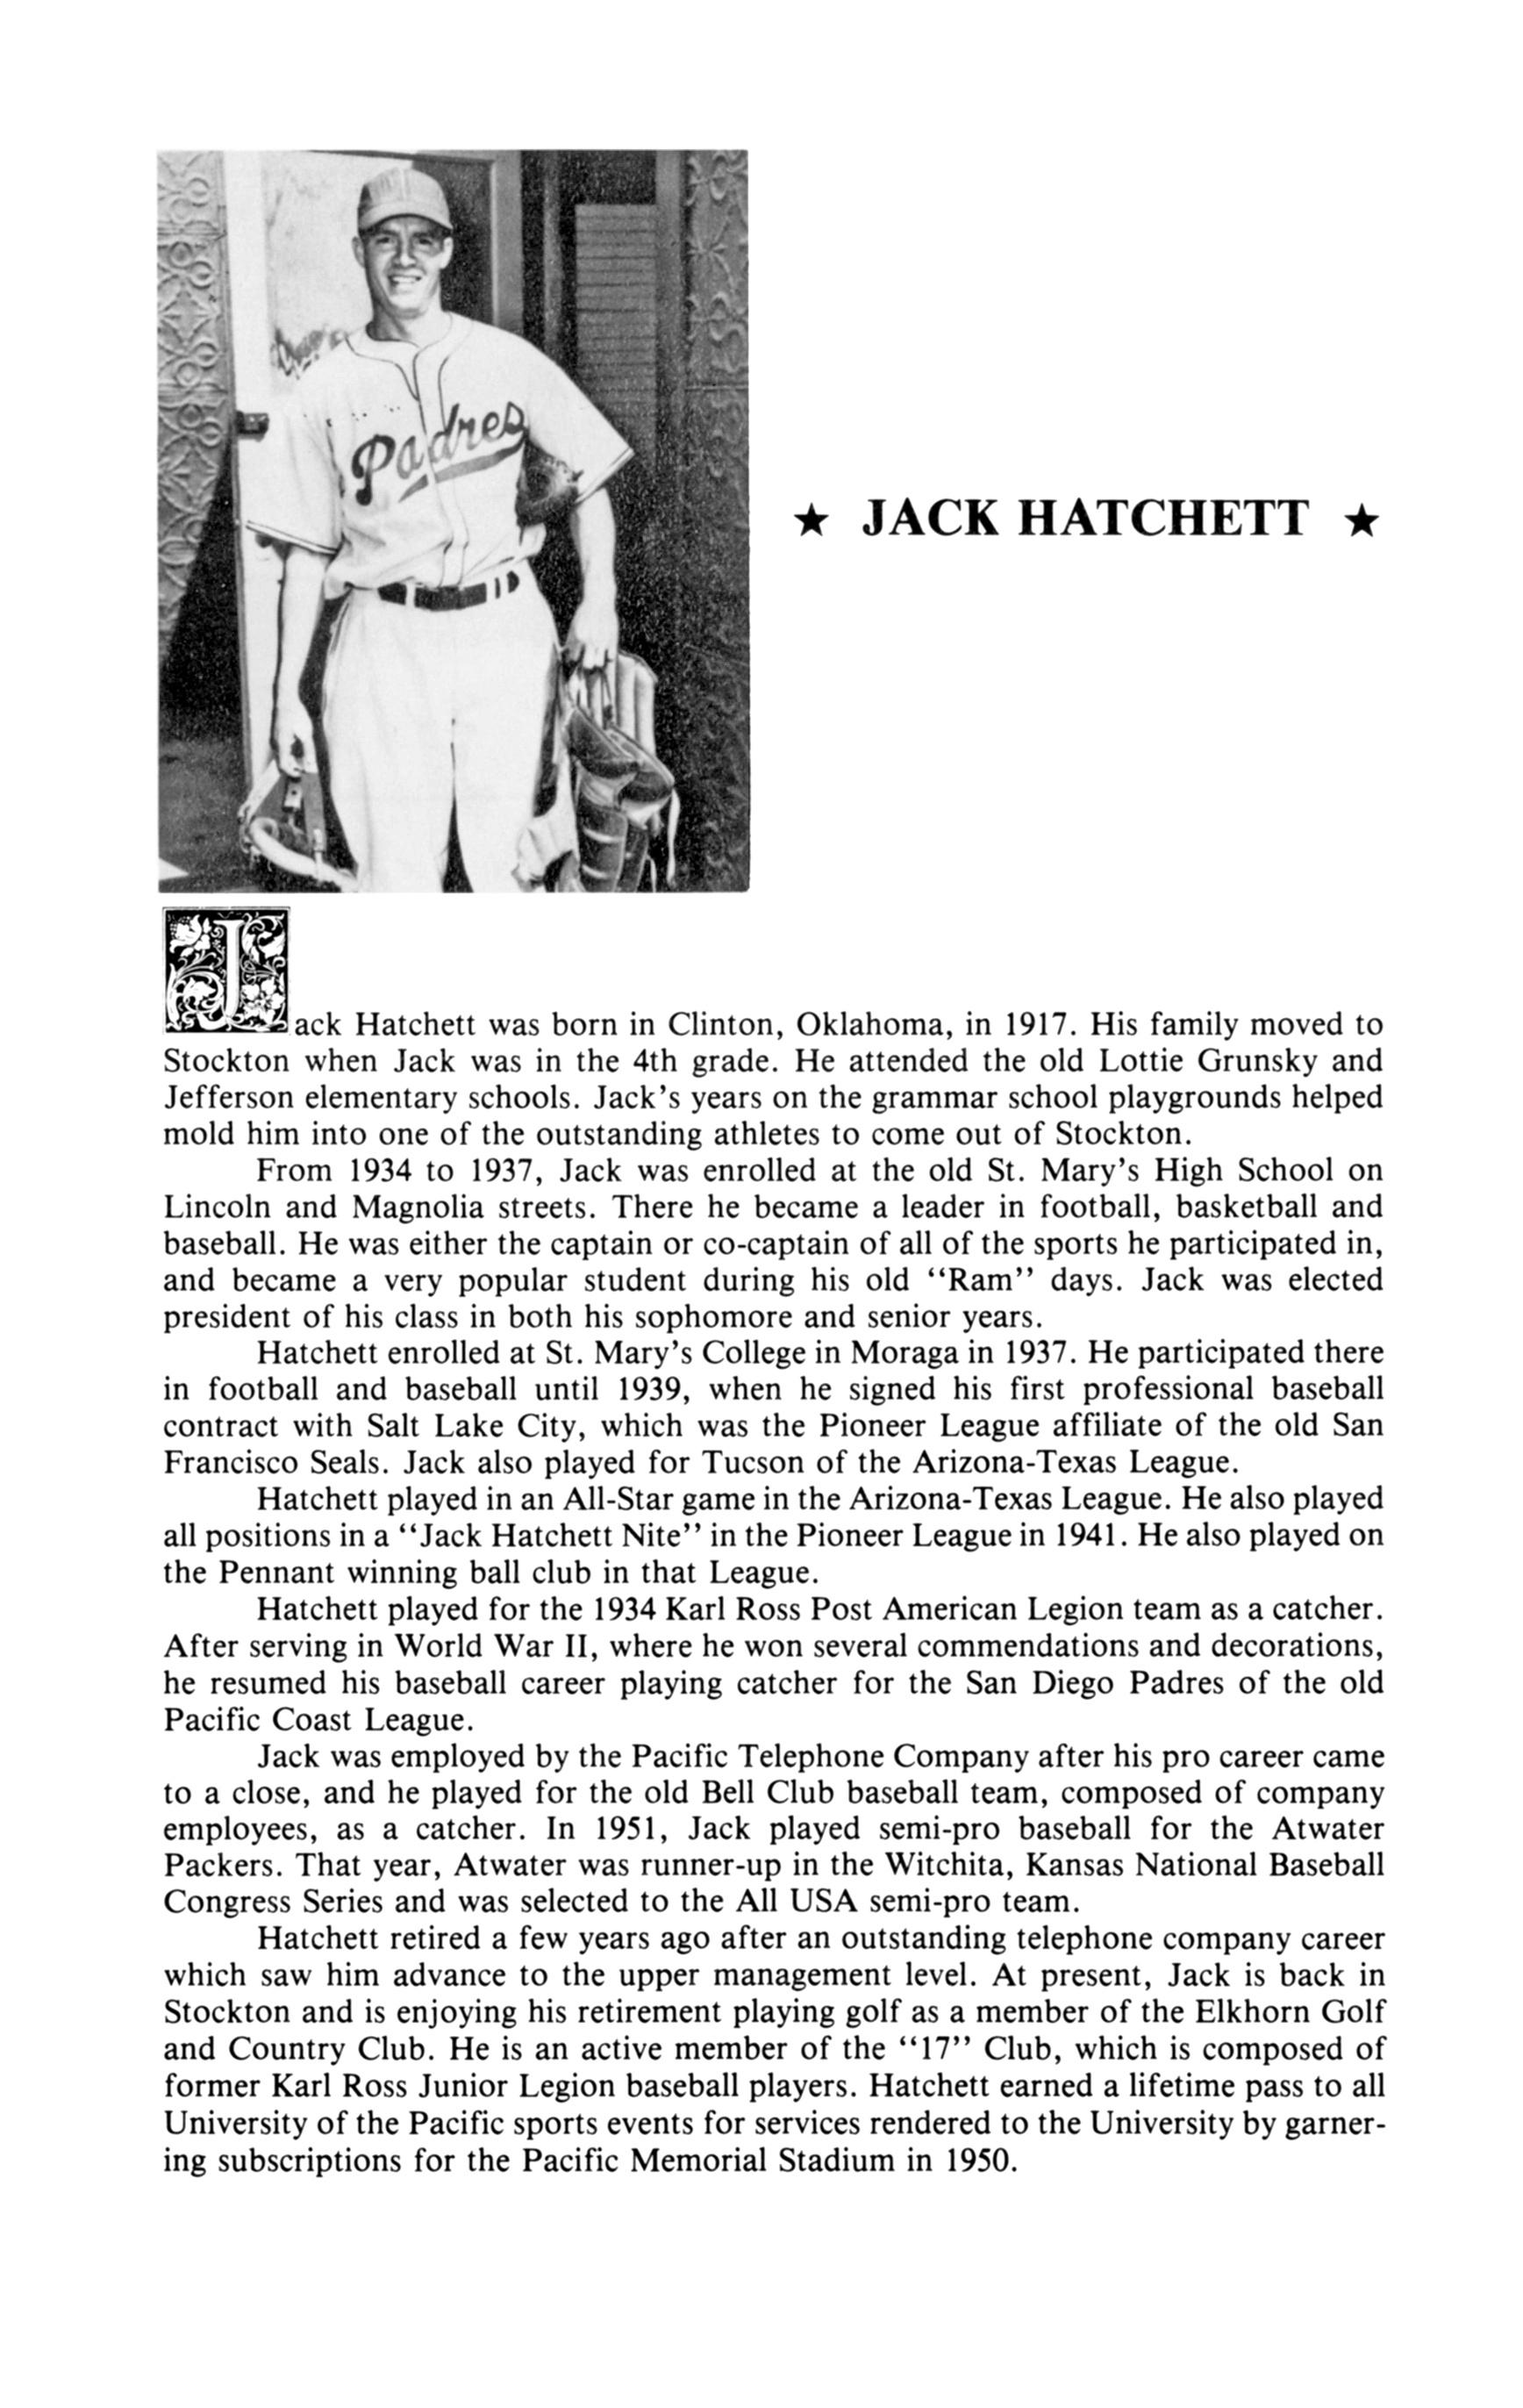 Jack-Hatchett-89_16